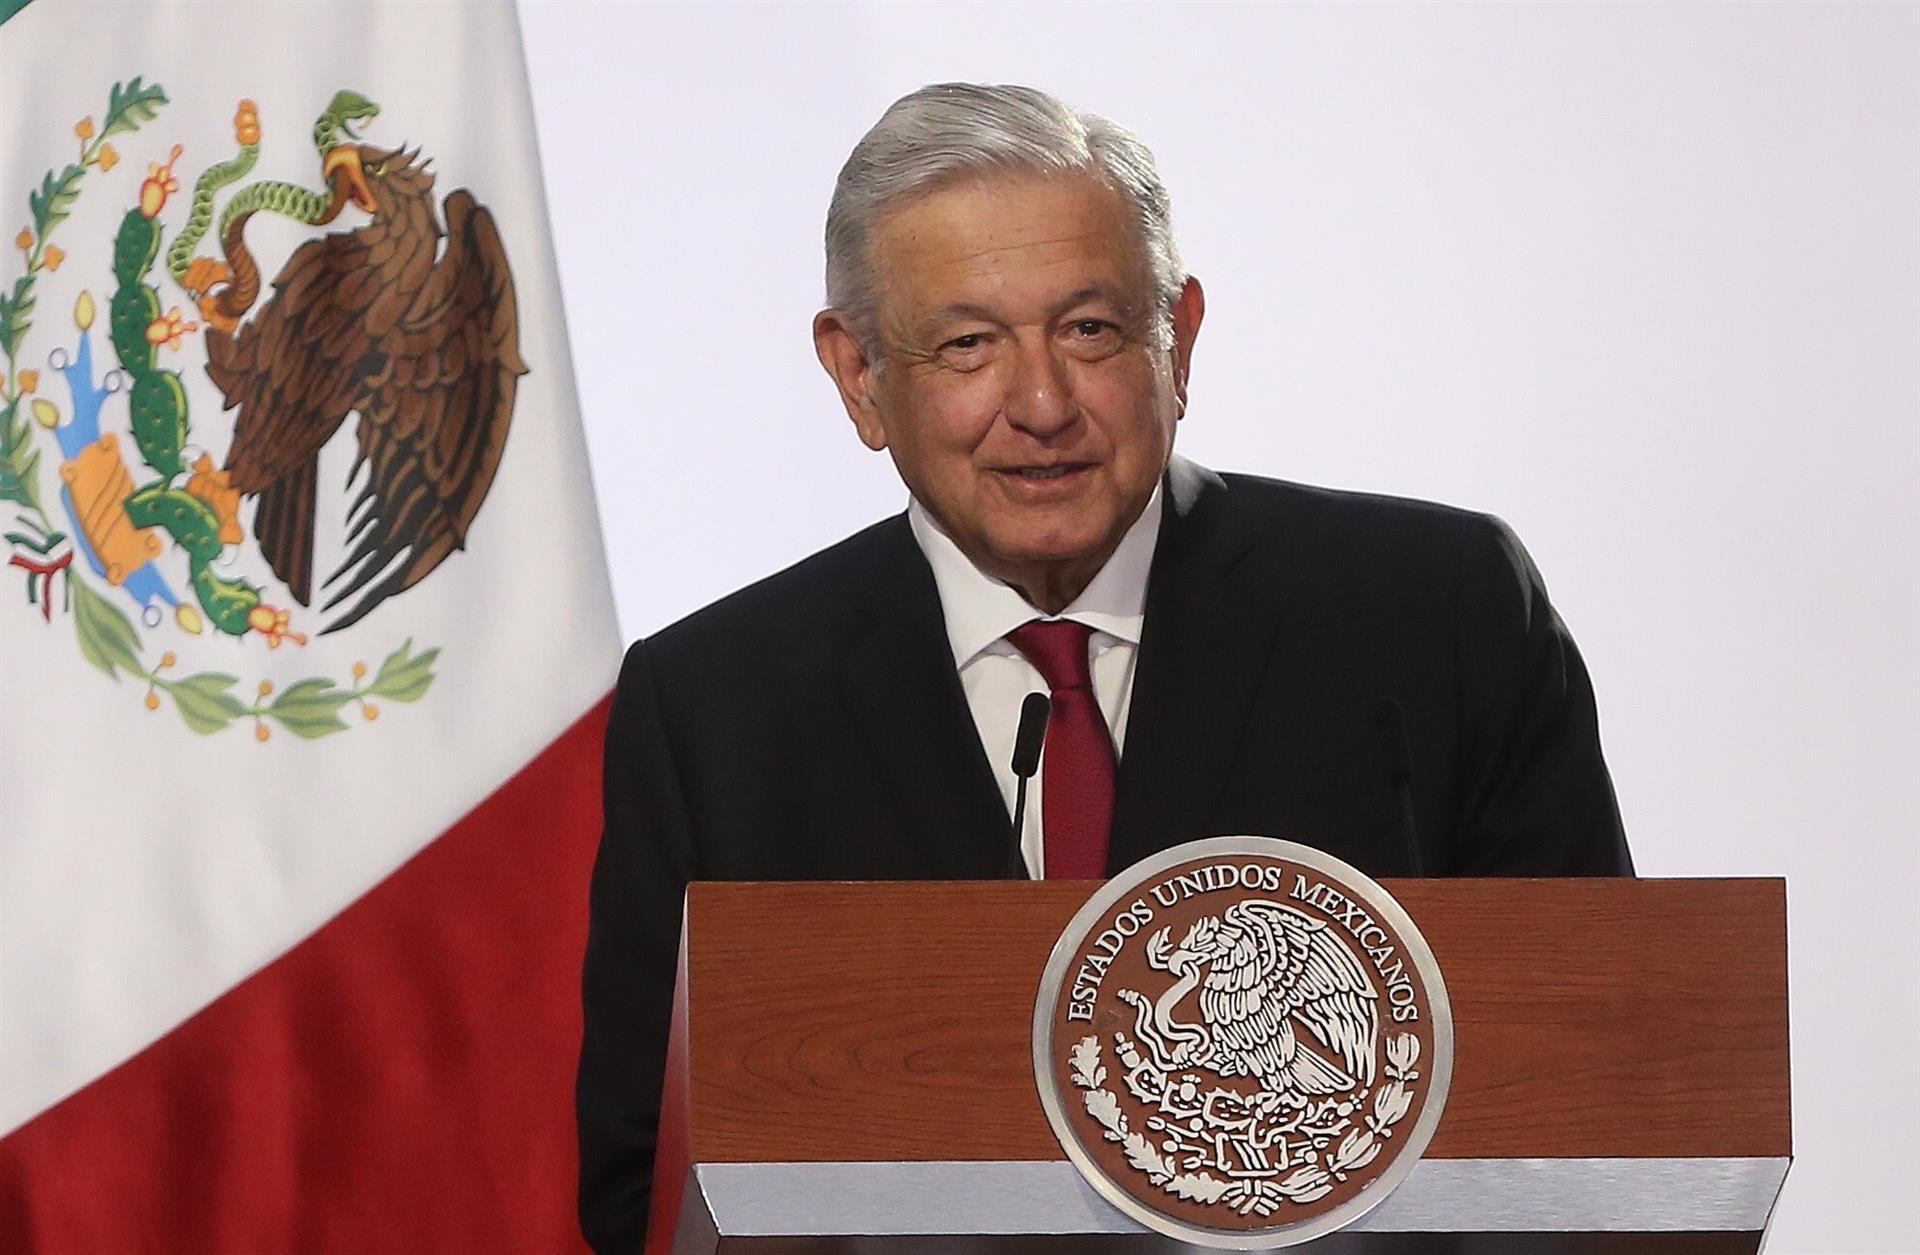 López Obrador referéndum